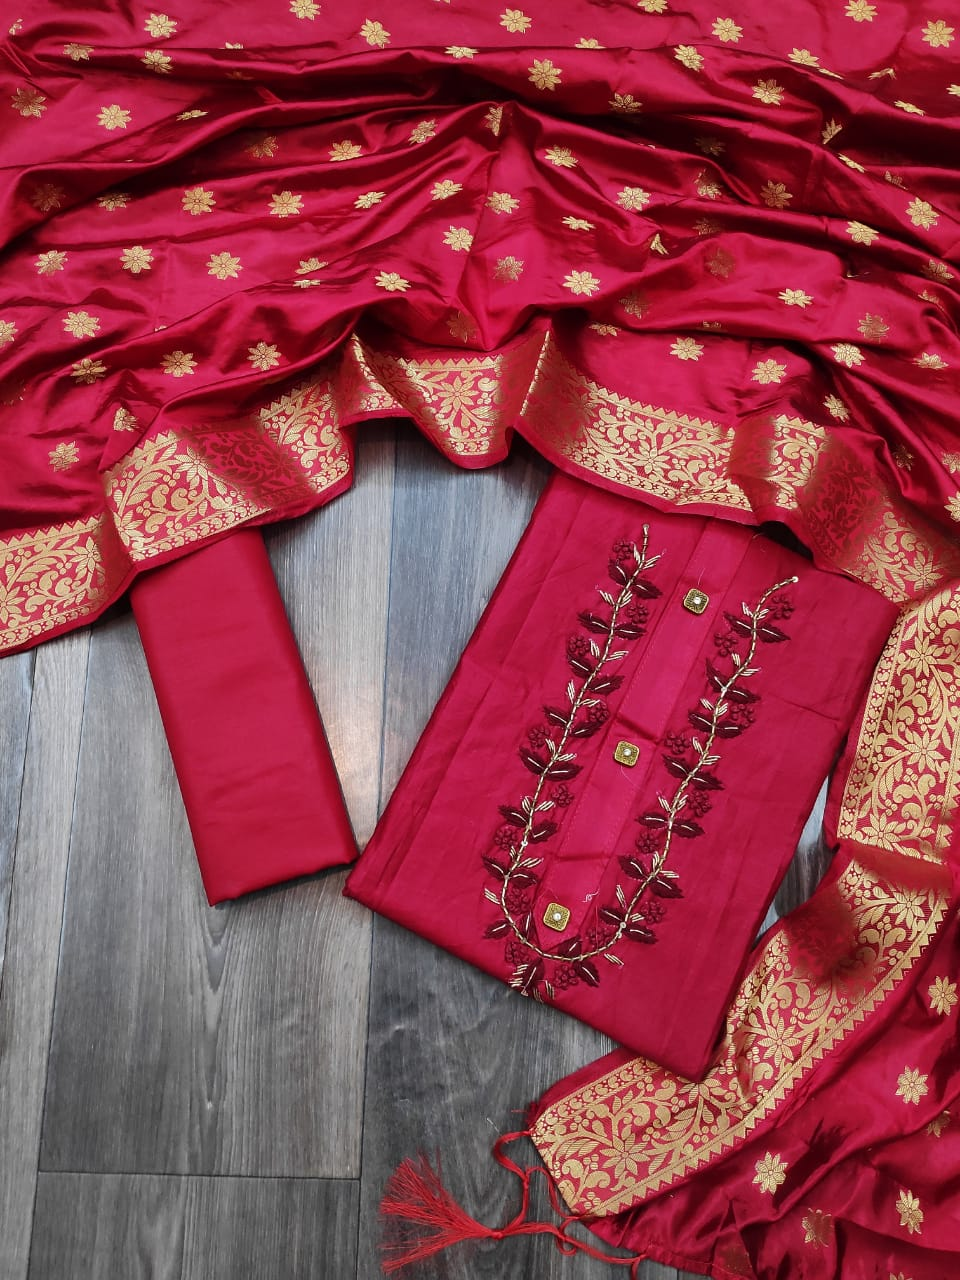 Thankar Festive Wear Jam Cotton With Banarasi Silk Duptta Dress Material Catalog at Wholesale rate